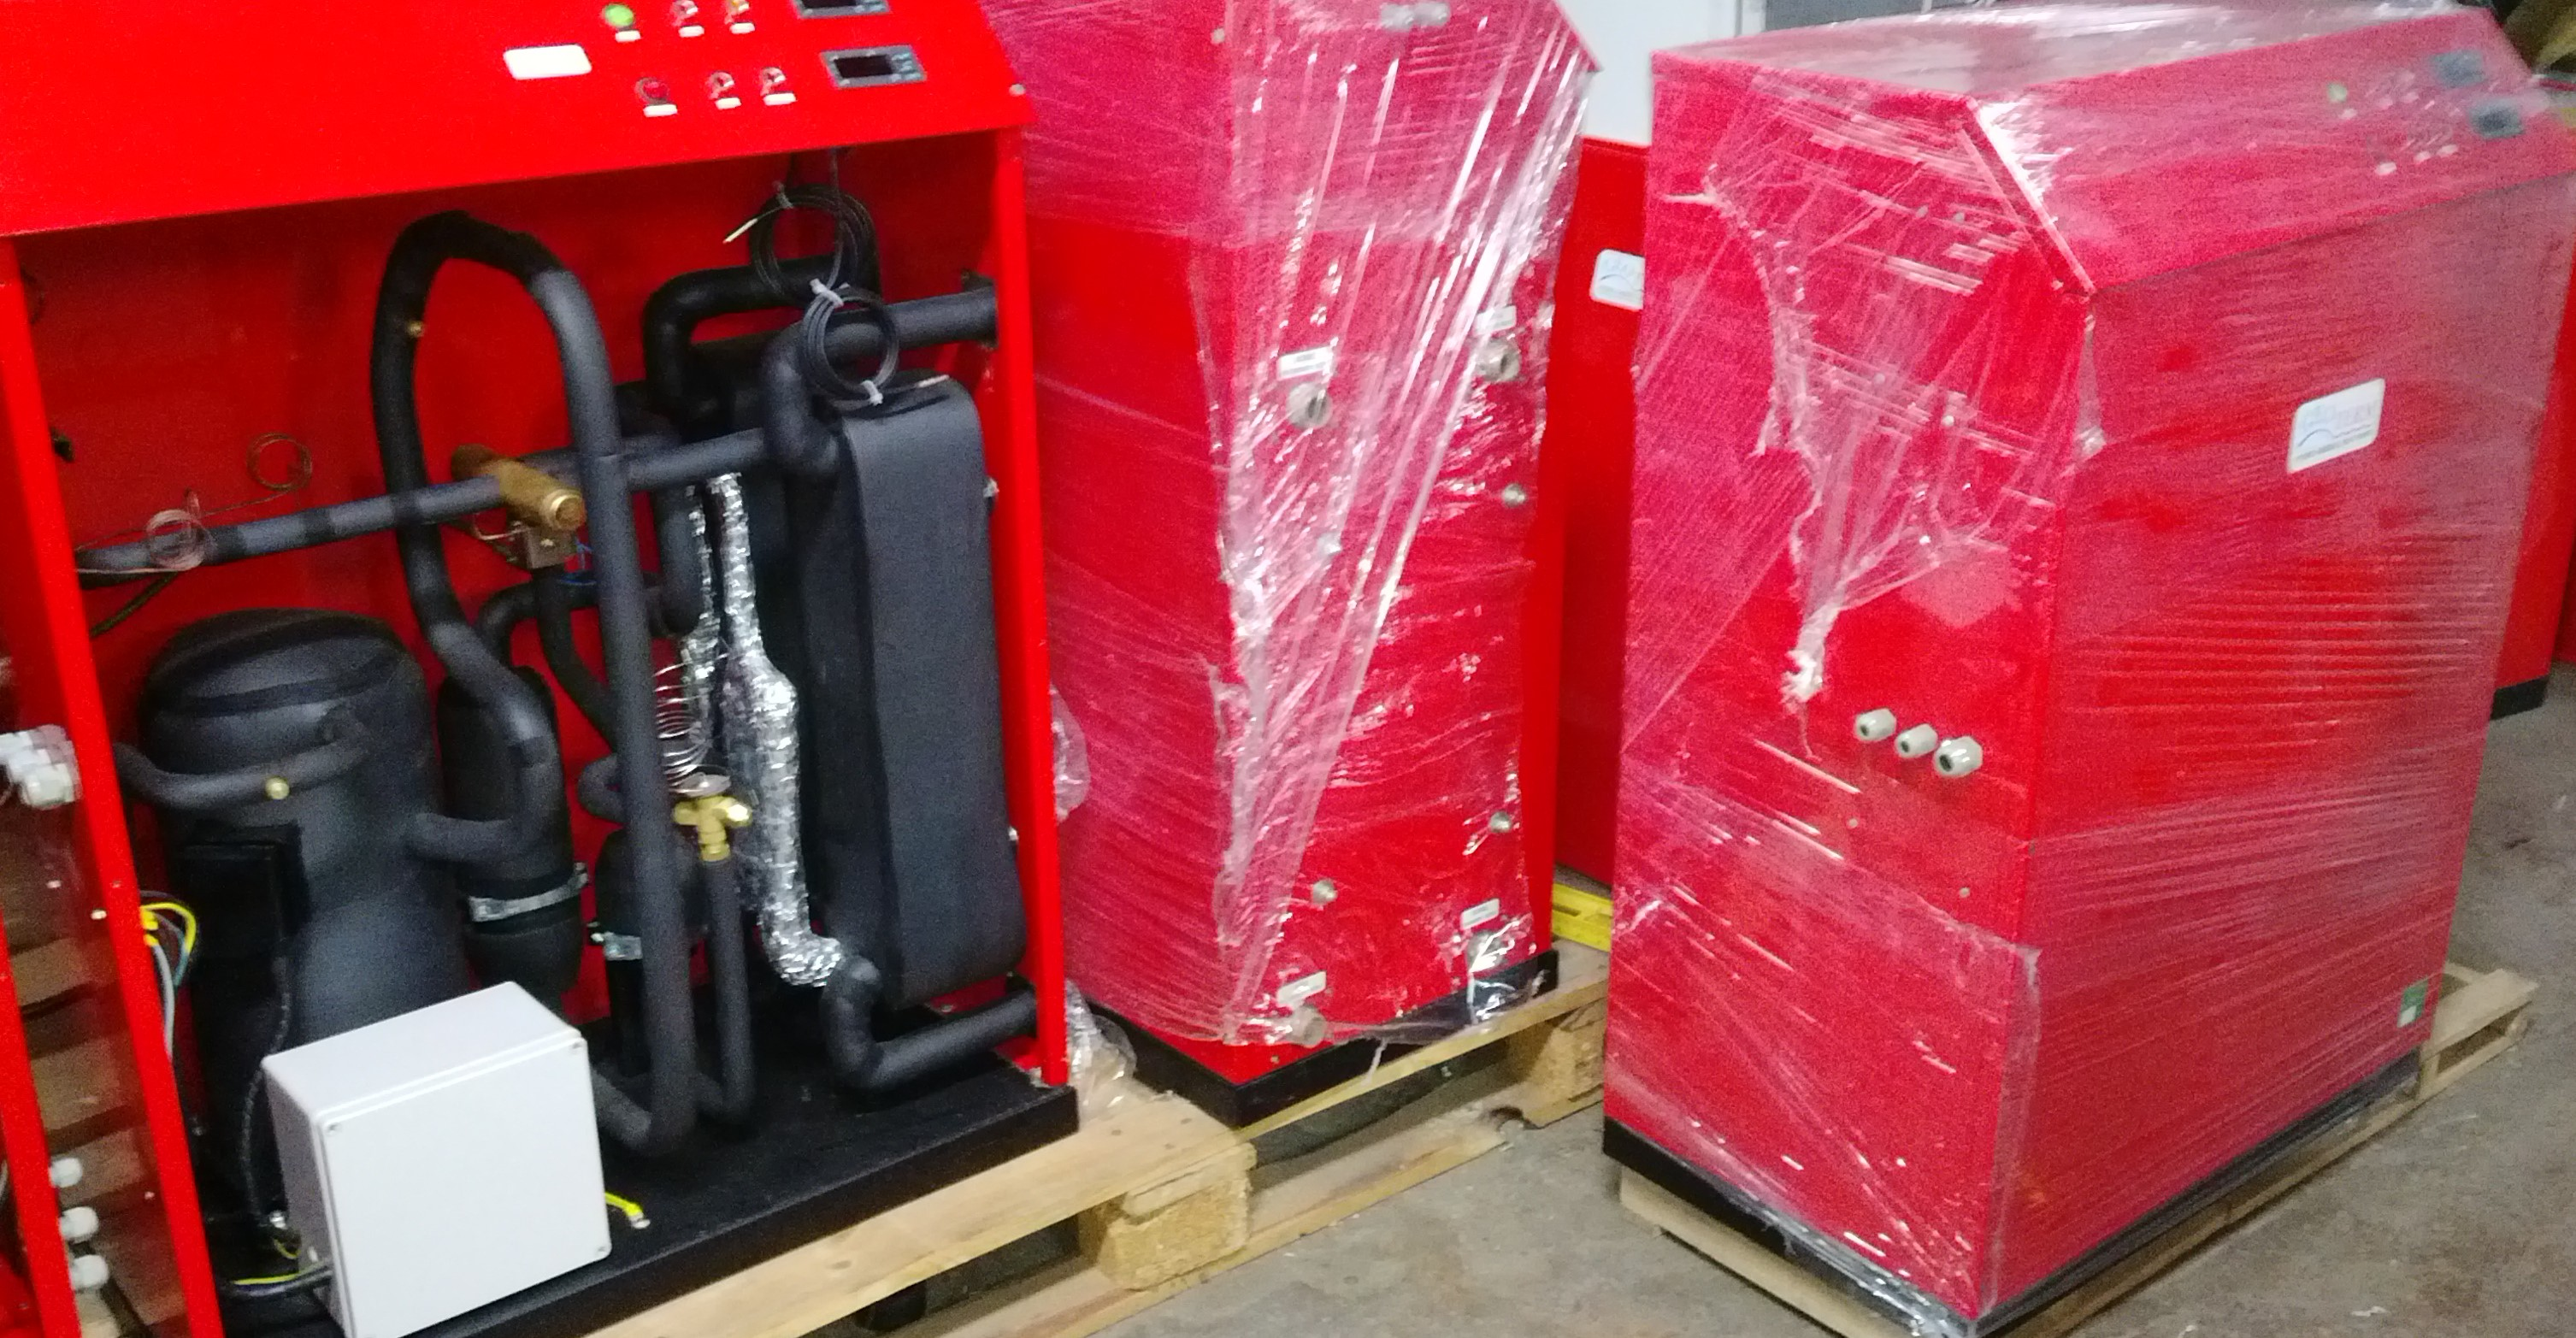 Хидро-термални агрегати готови и в процес на изработка